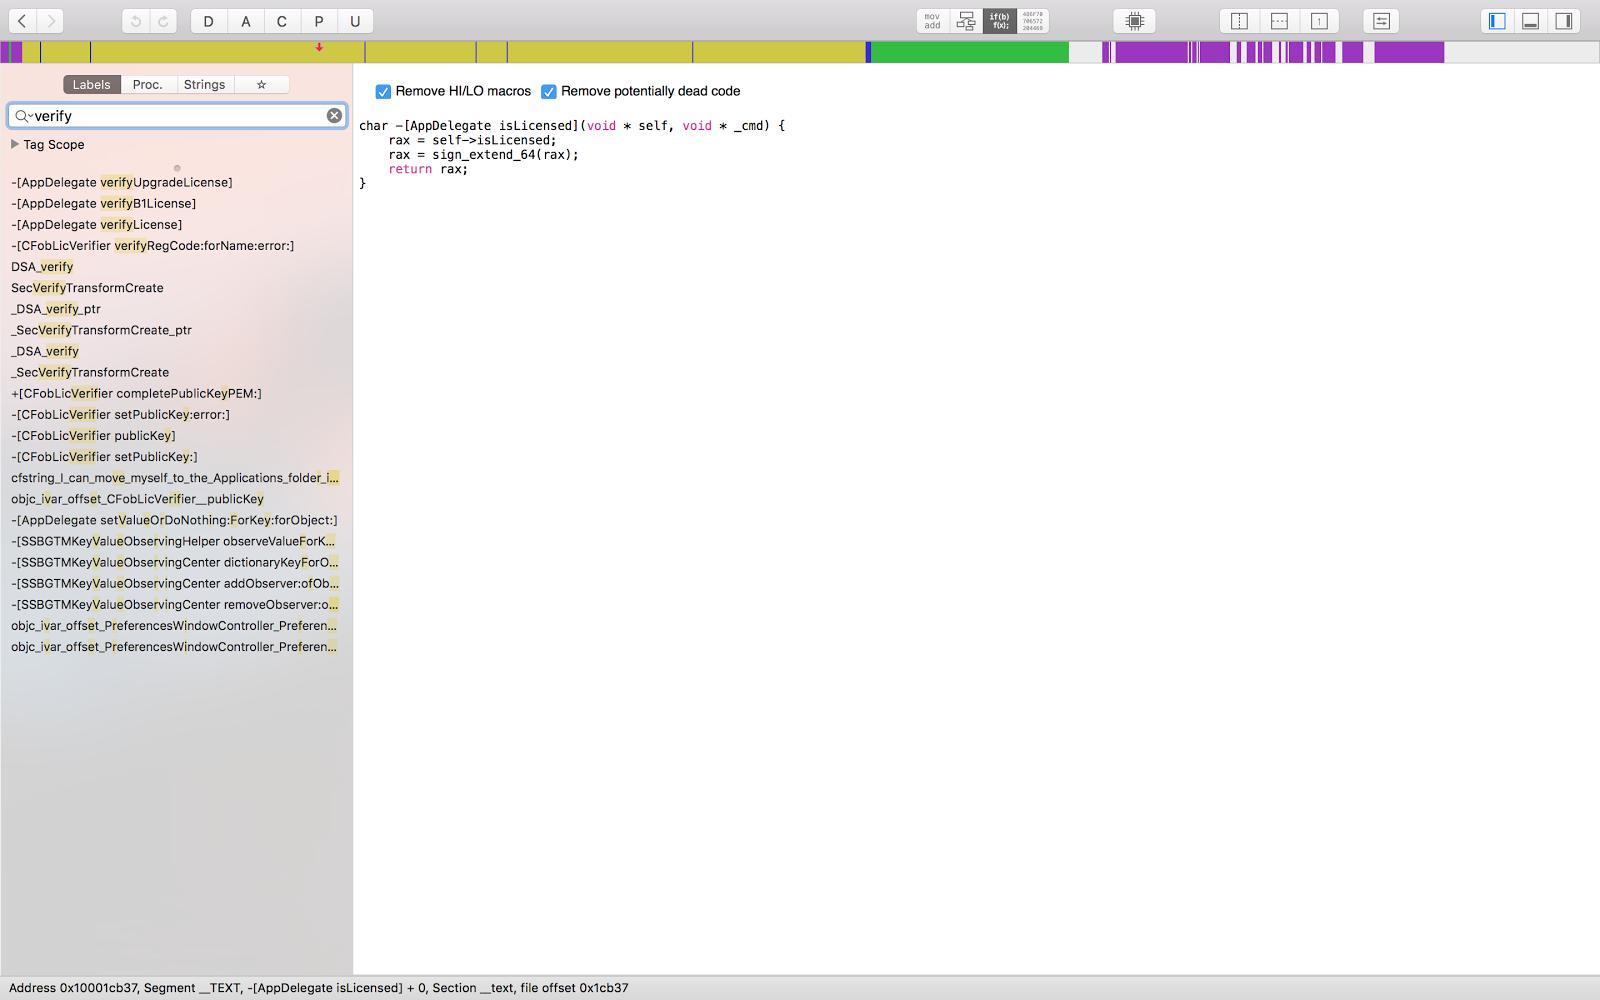 Bartender 2.1.6 mac license key version